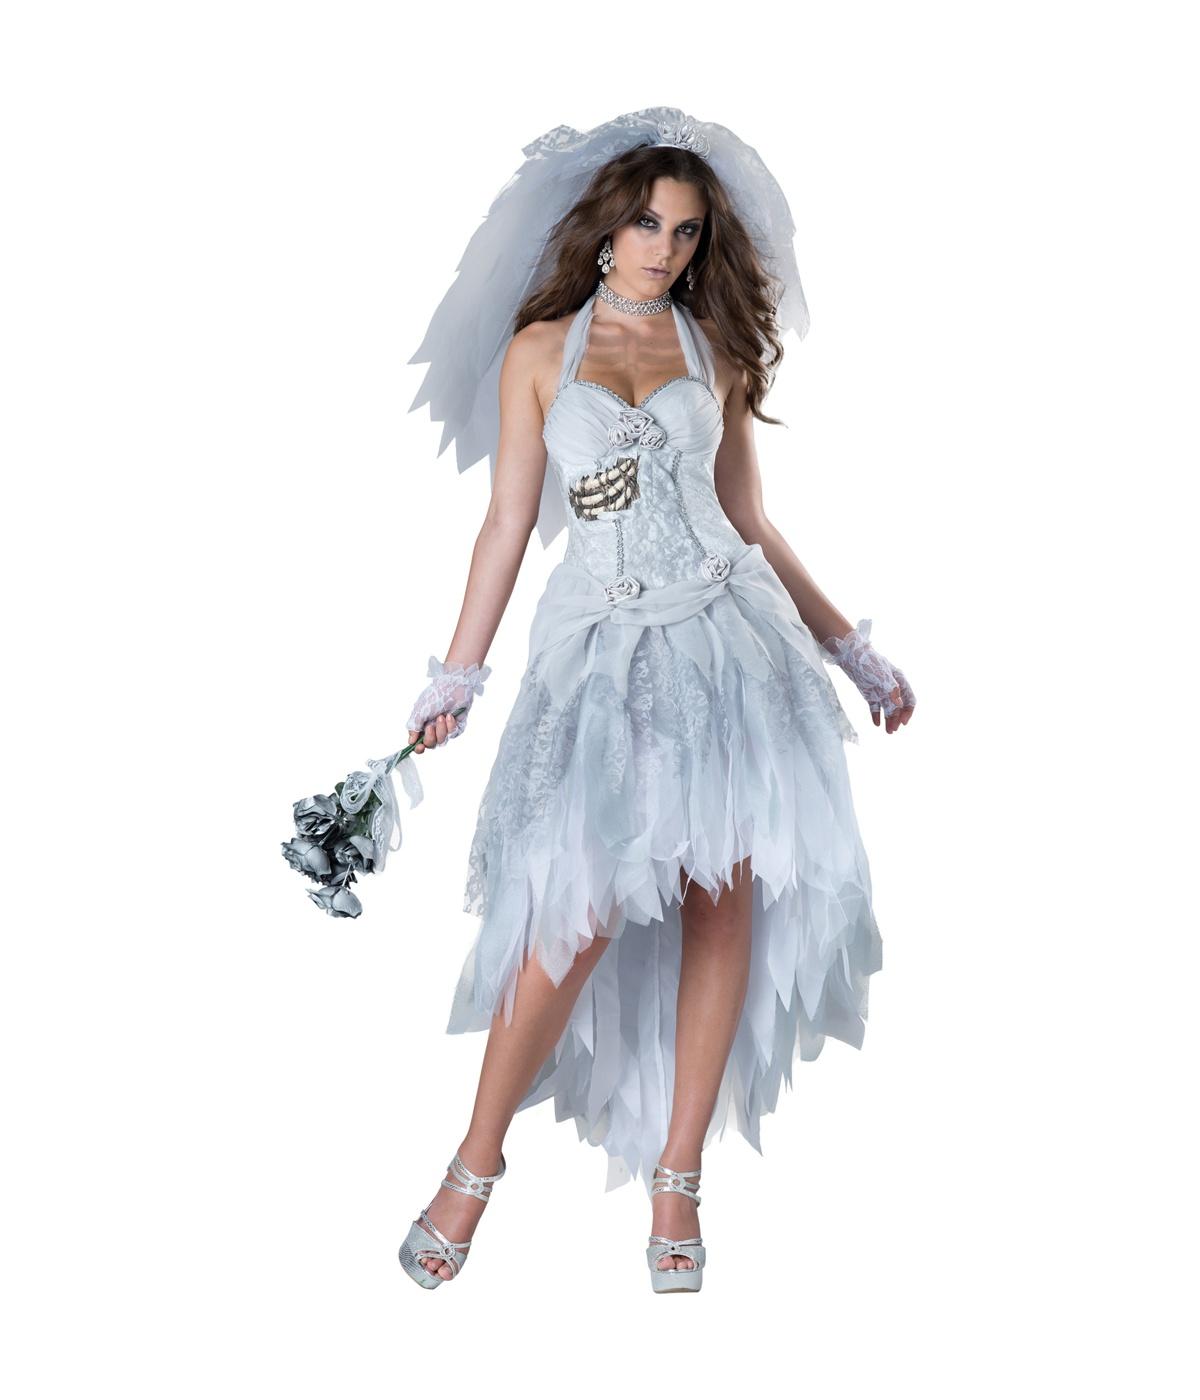 Bide Costume For Girls And Women